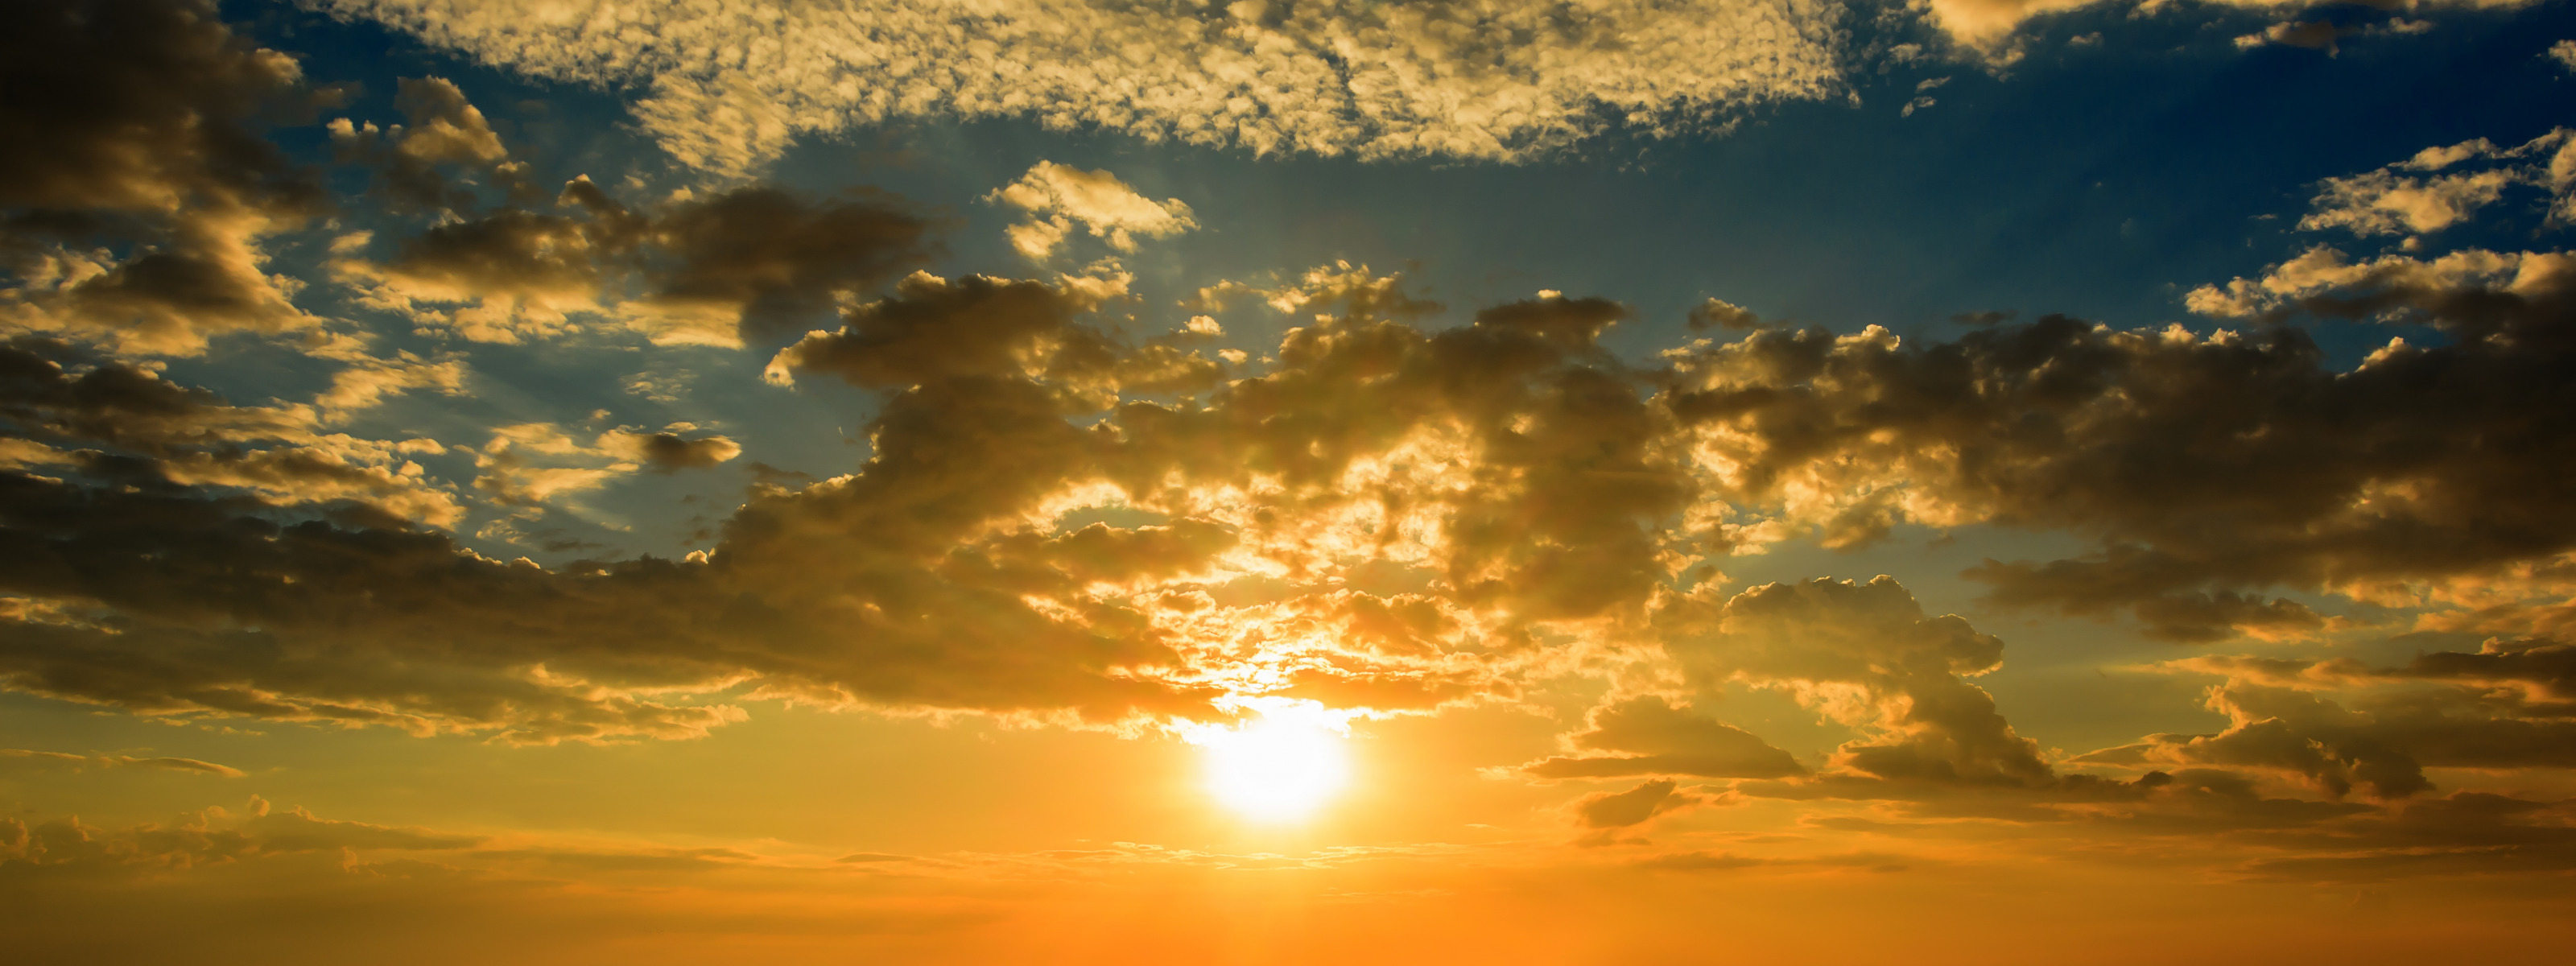 zakat-golden-nebo-seascape-sand-romantic-sea-pliazh-leto-s-1